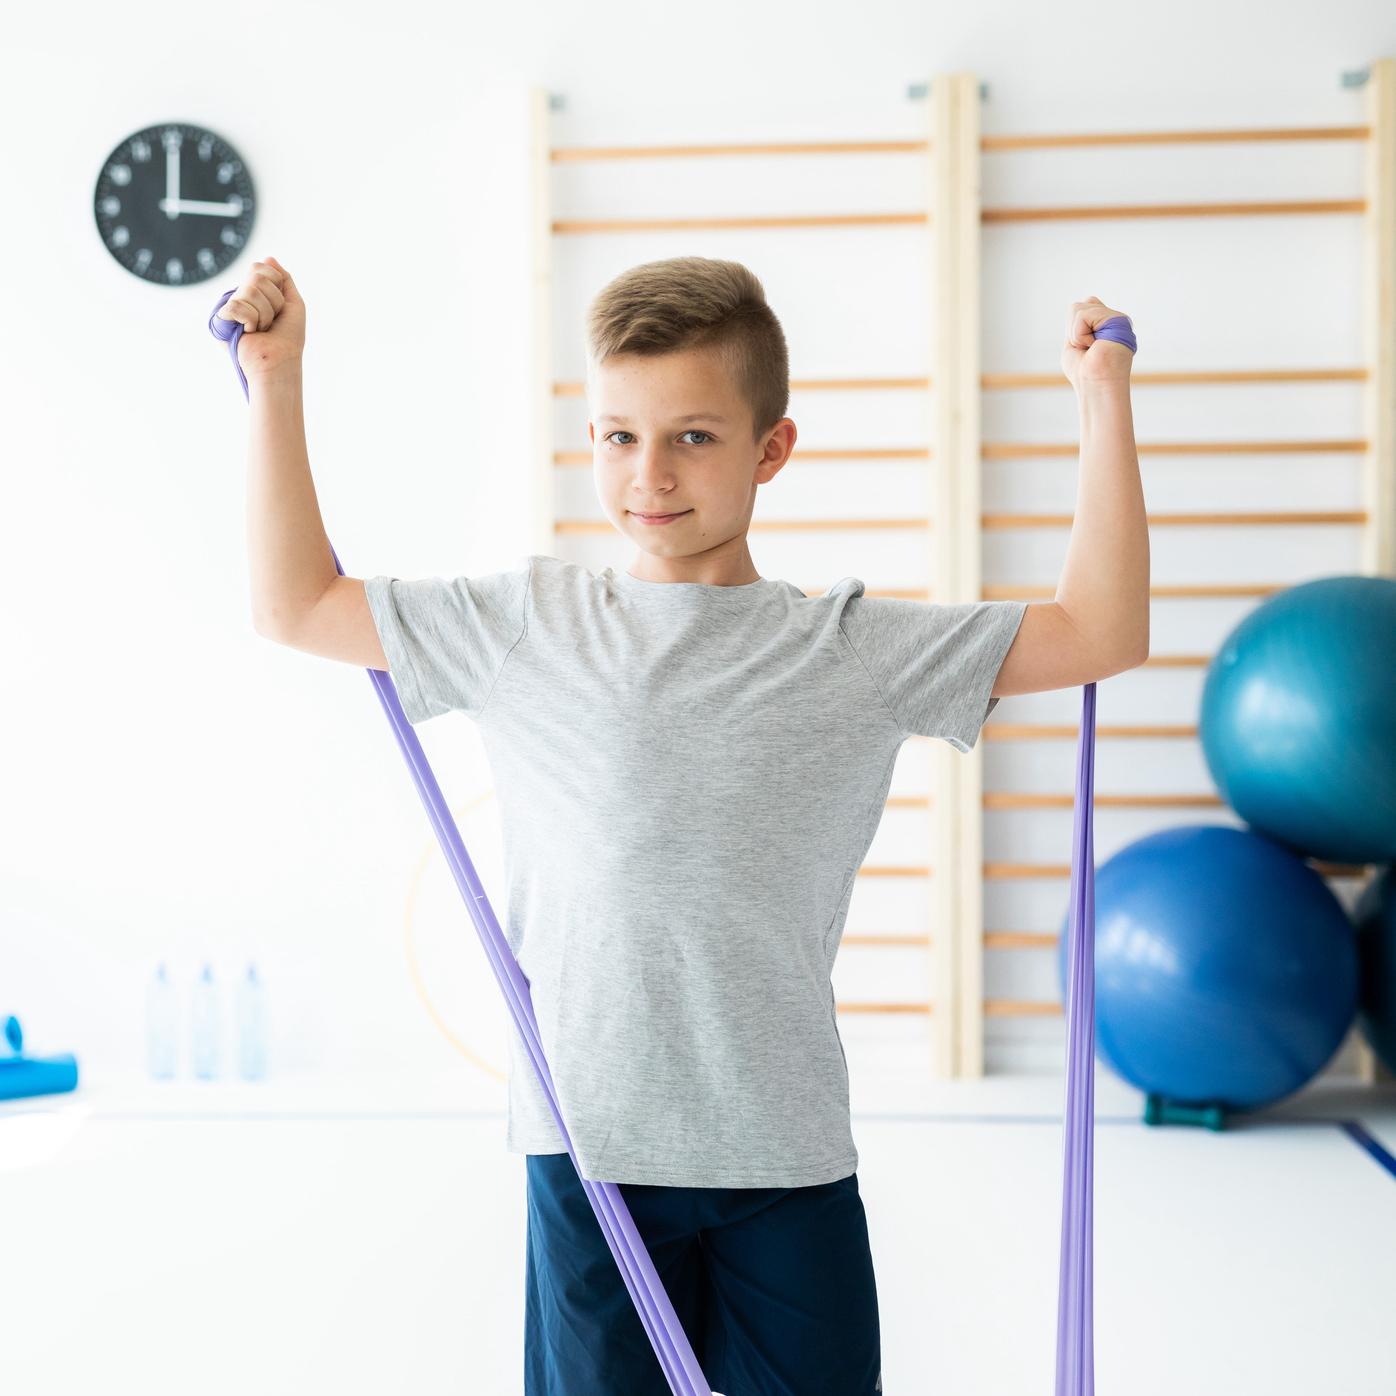 boy using exercise bands